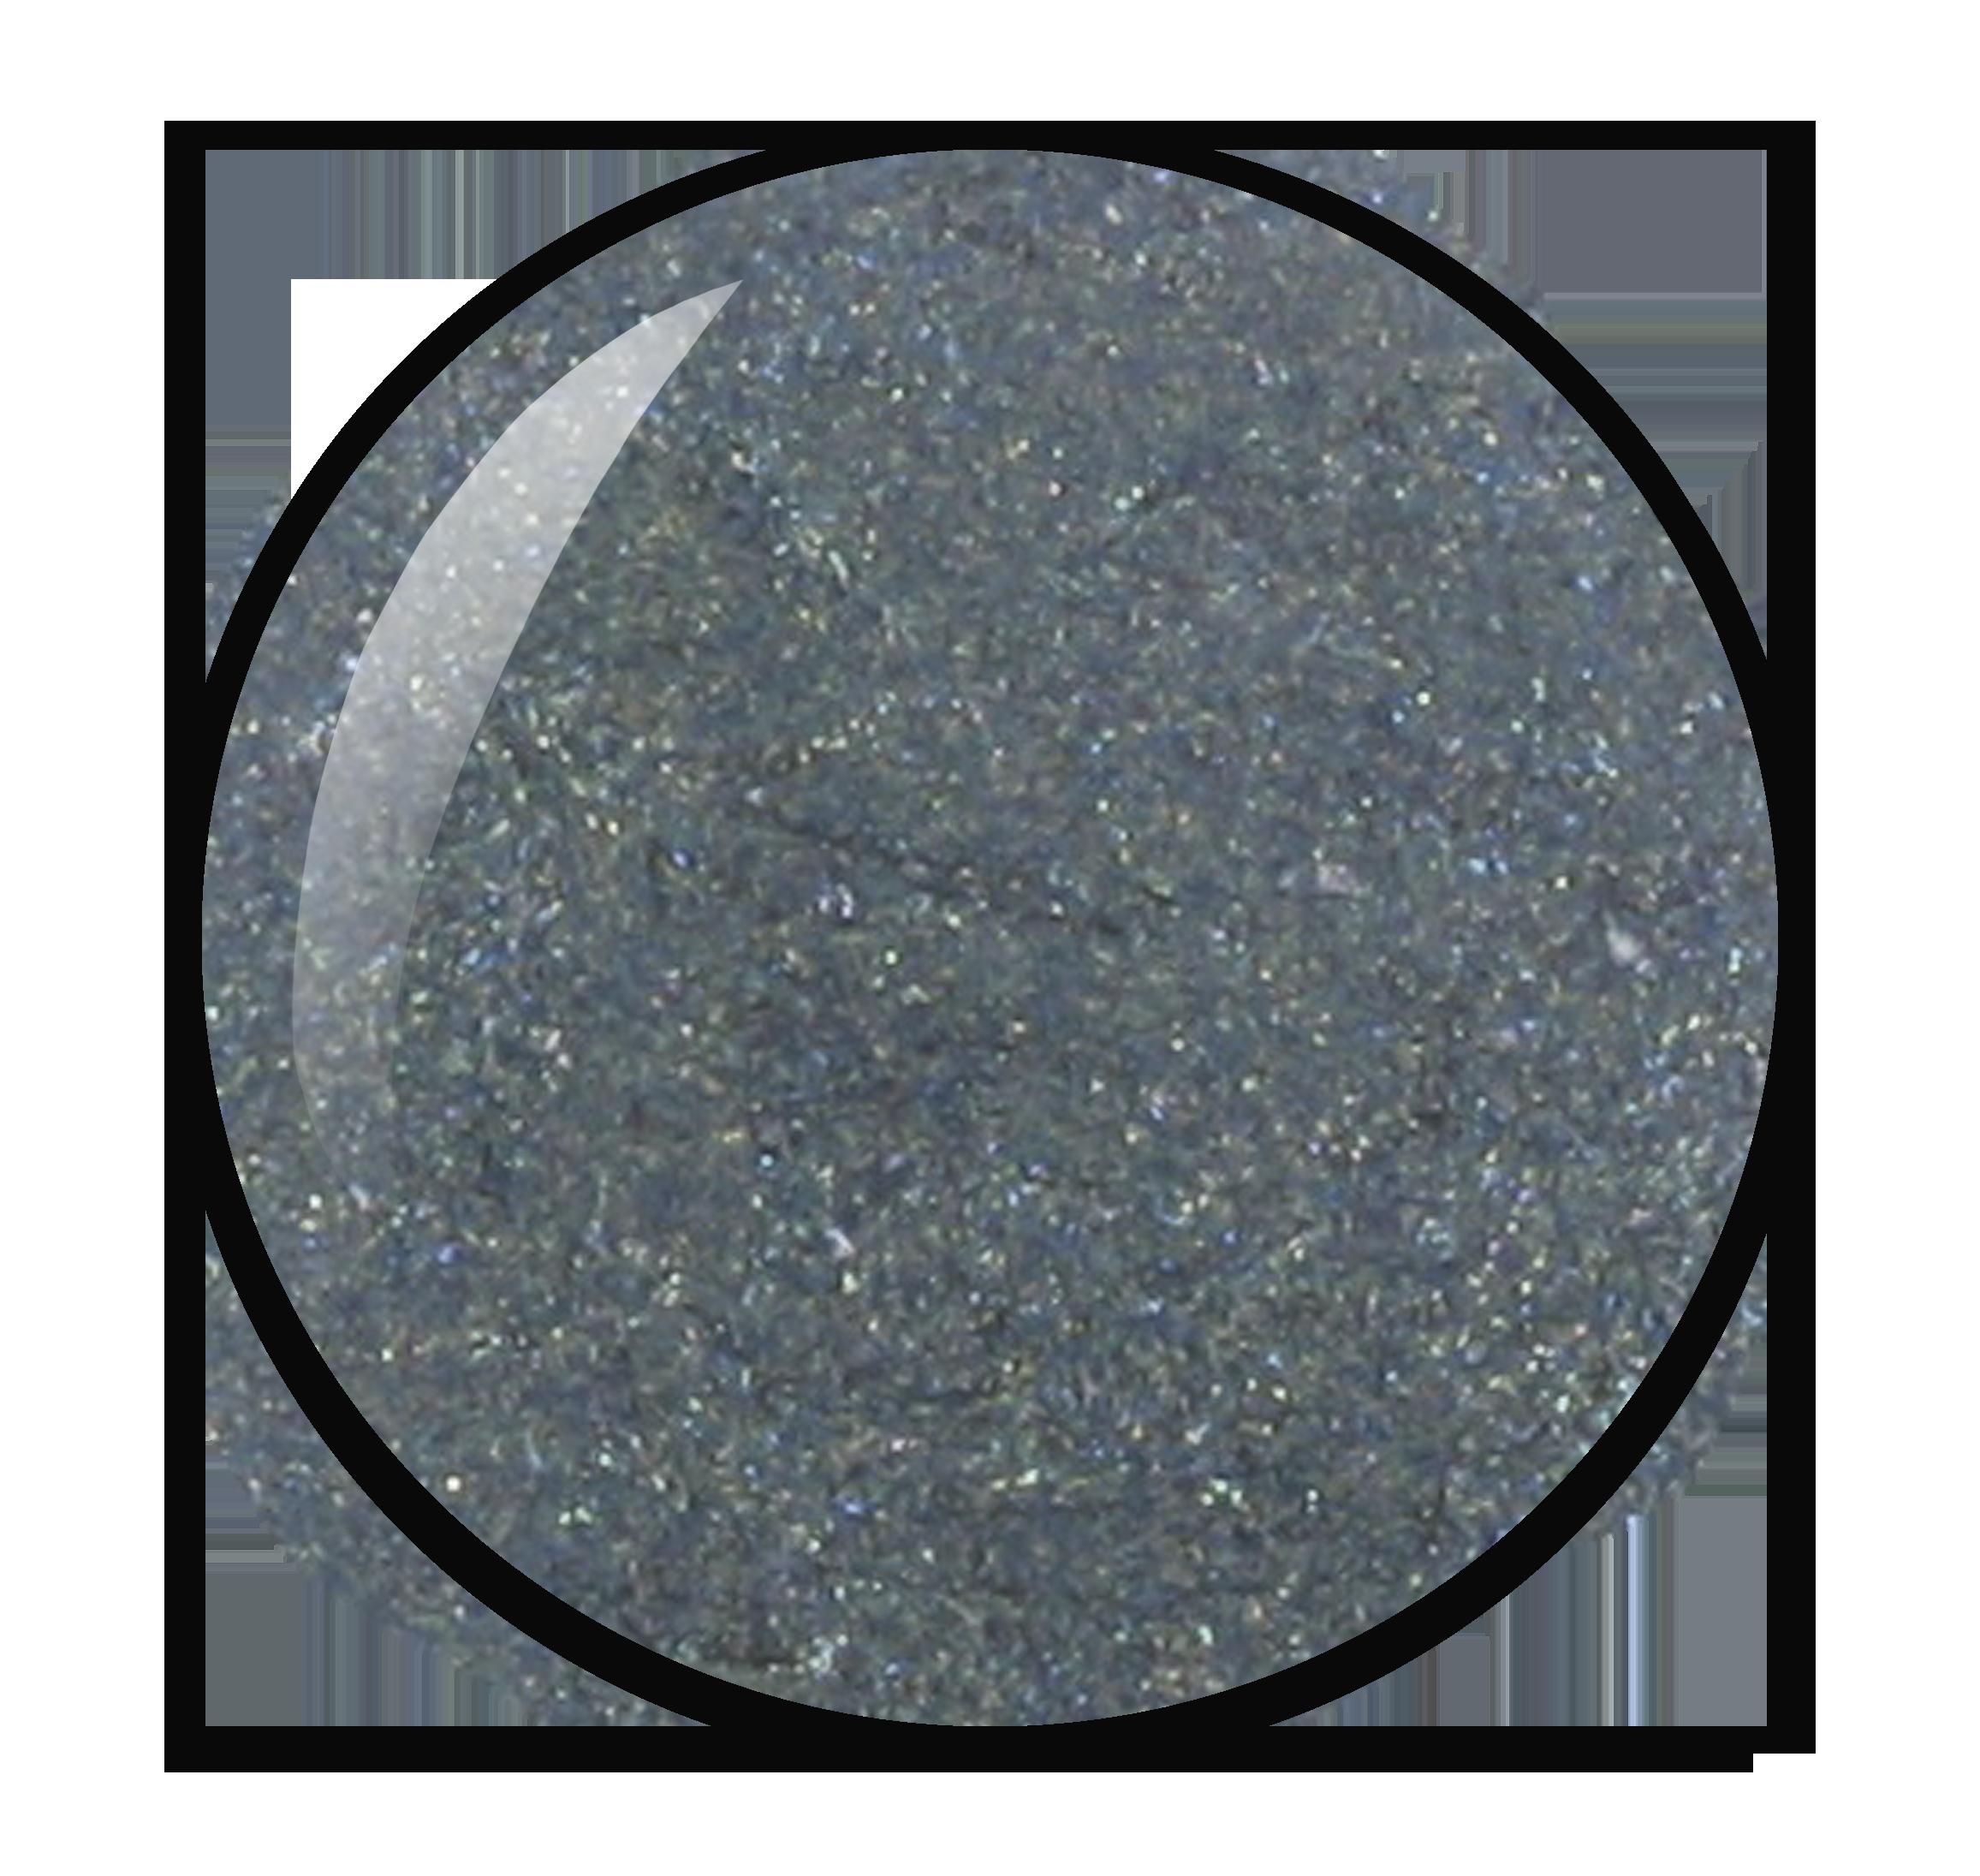 glitternagellak nummer 162 van de Herôme nagellak kleuren